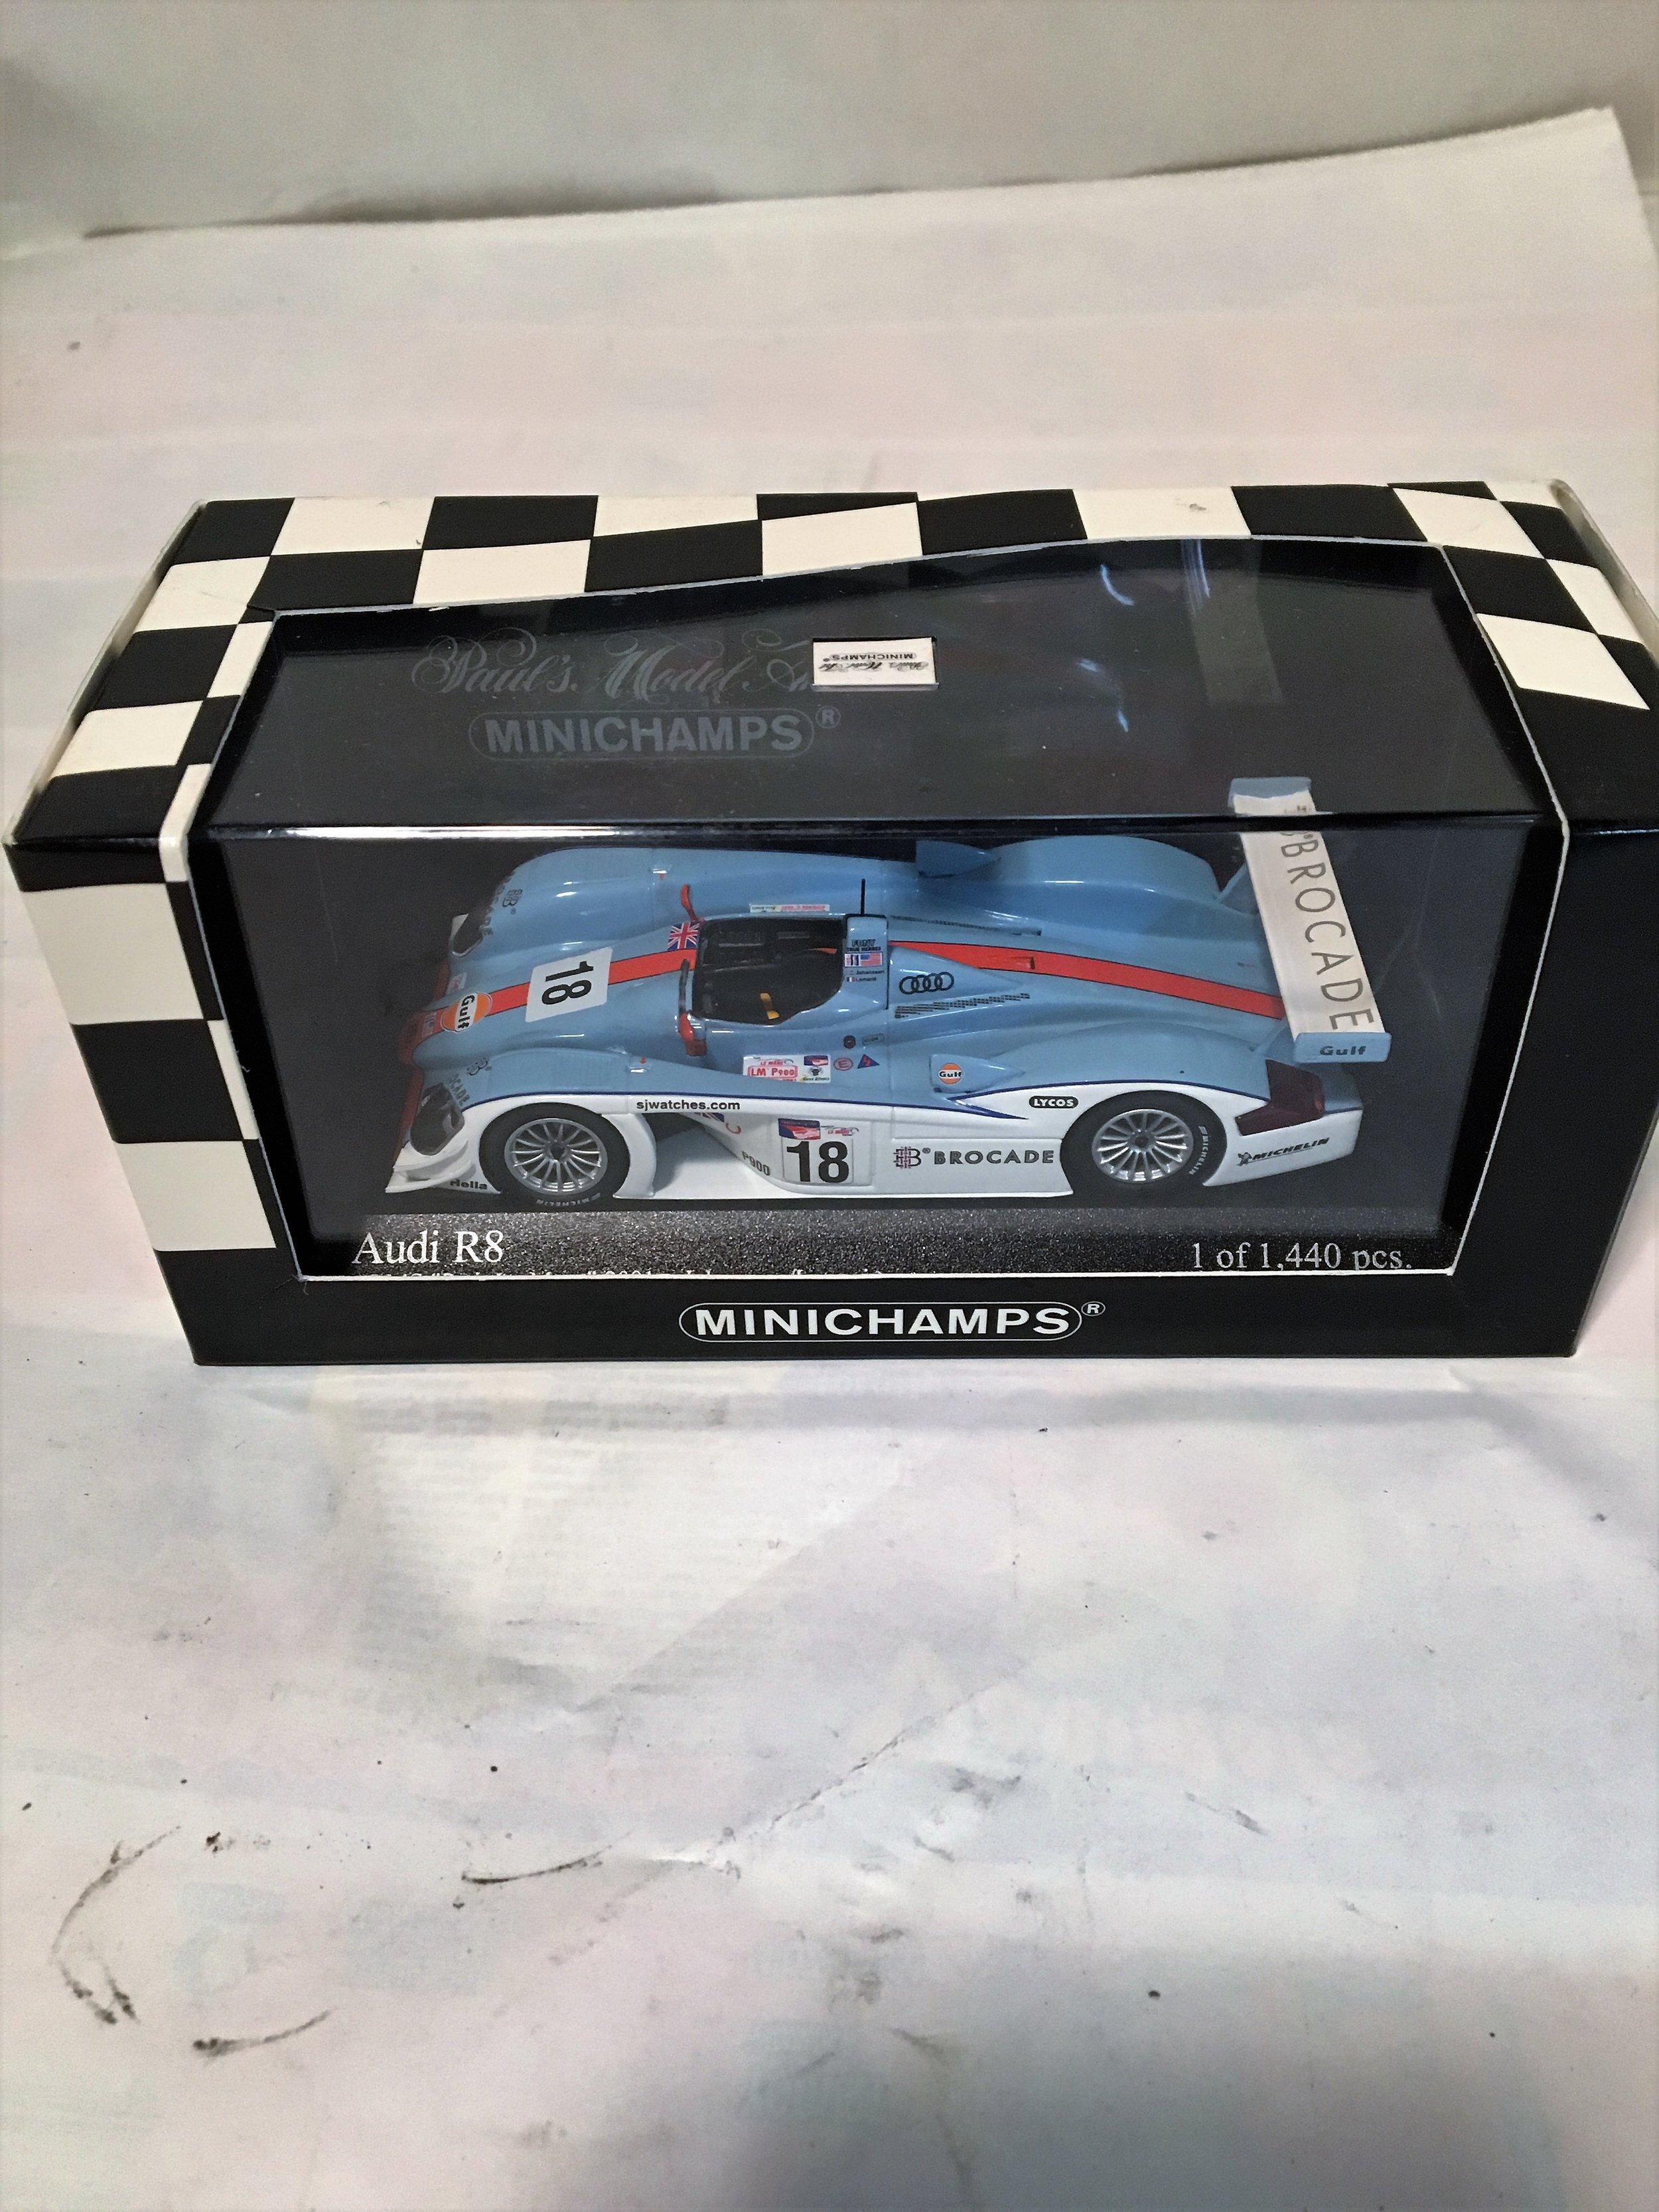 MinichampsR8Blue1.JPG